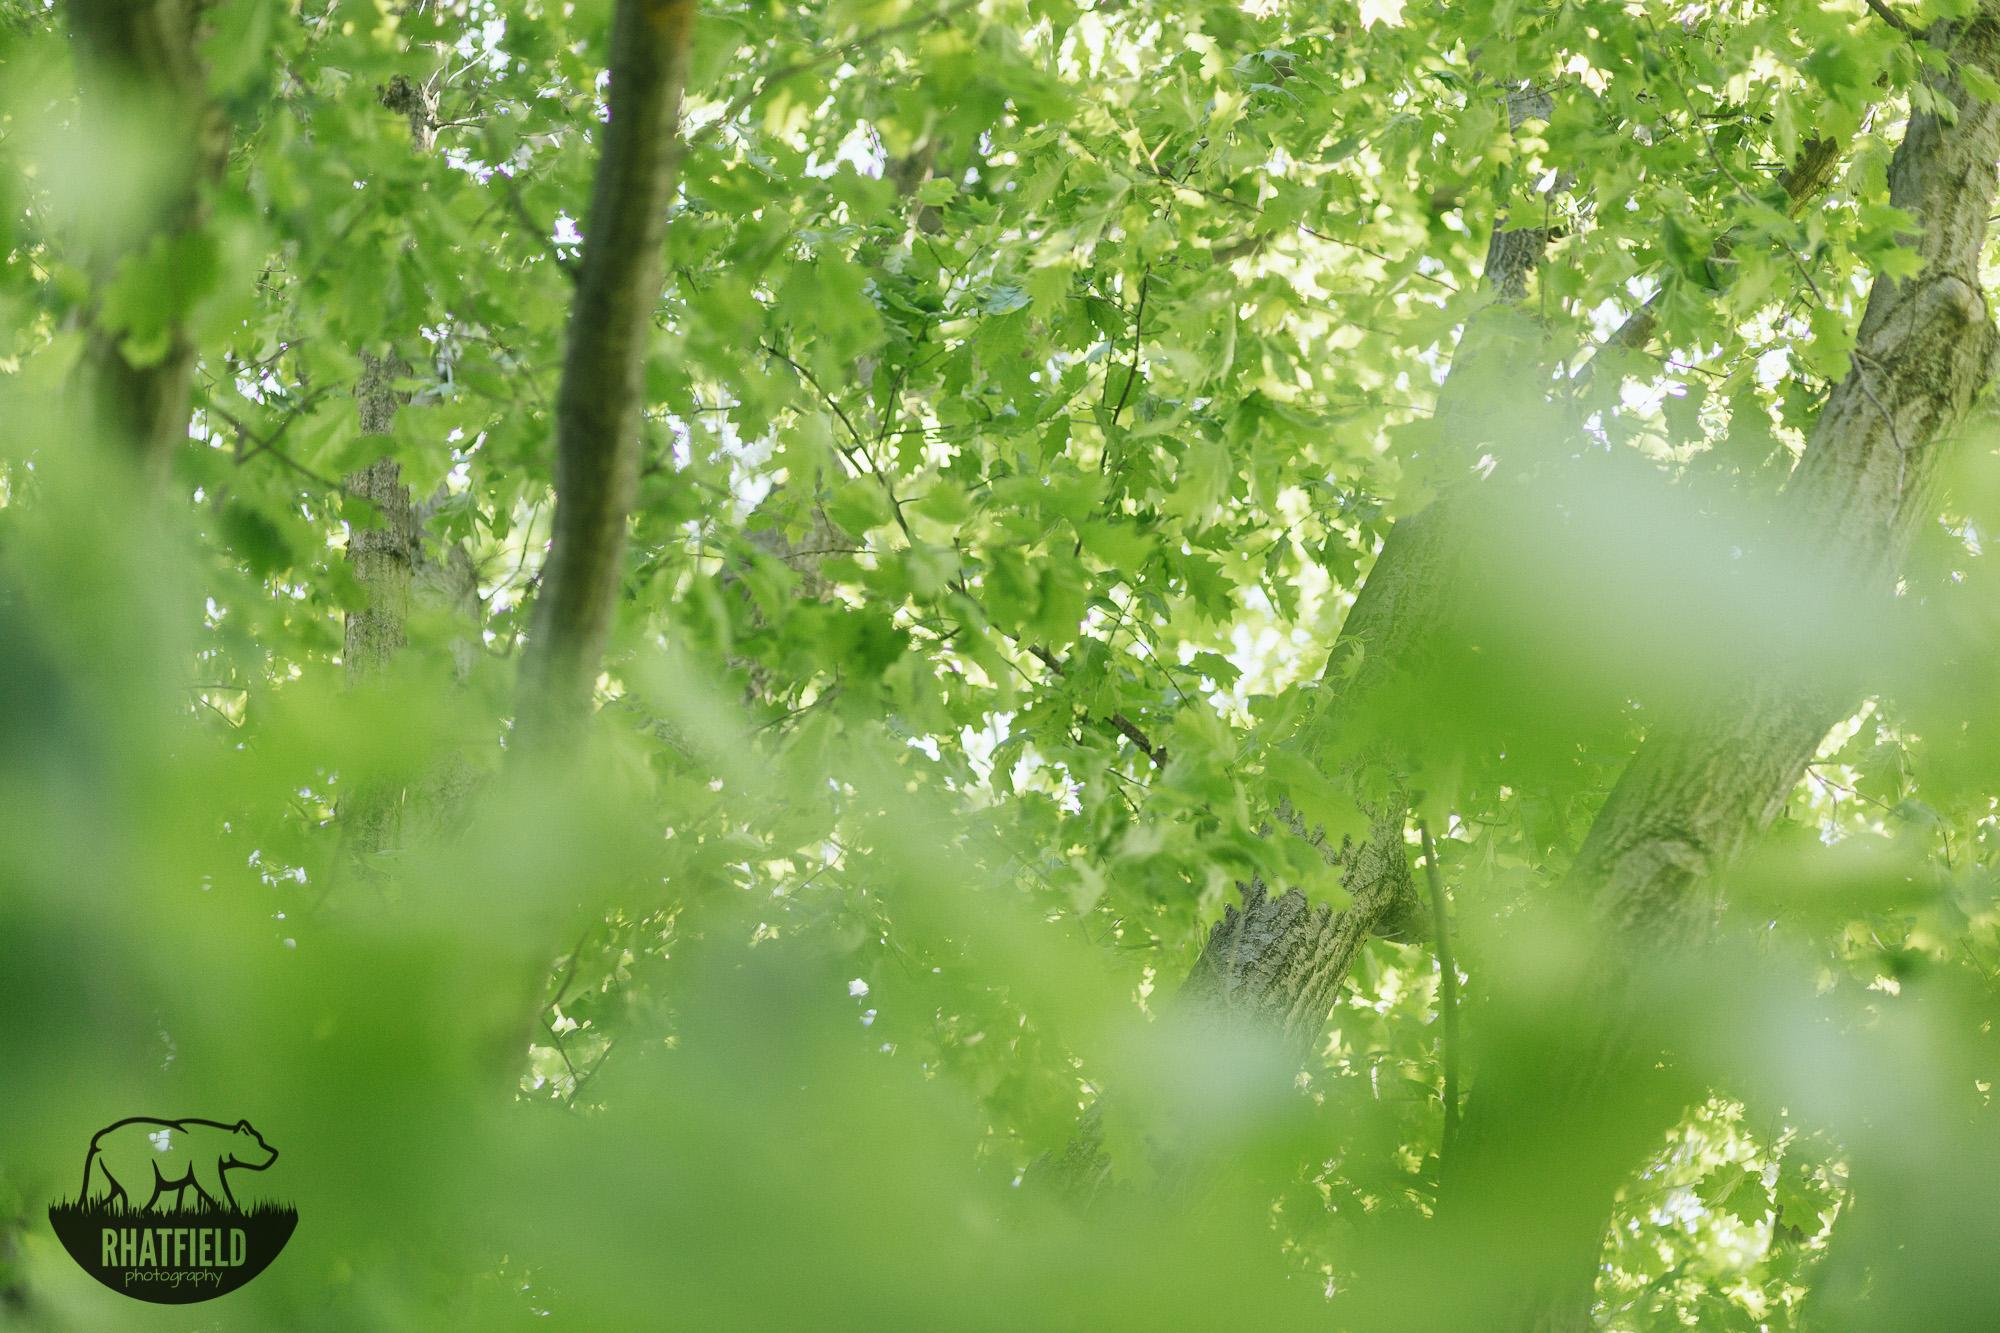 trees-jameson-camp-indianapolis